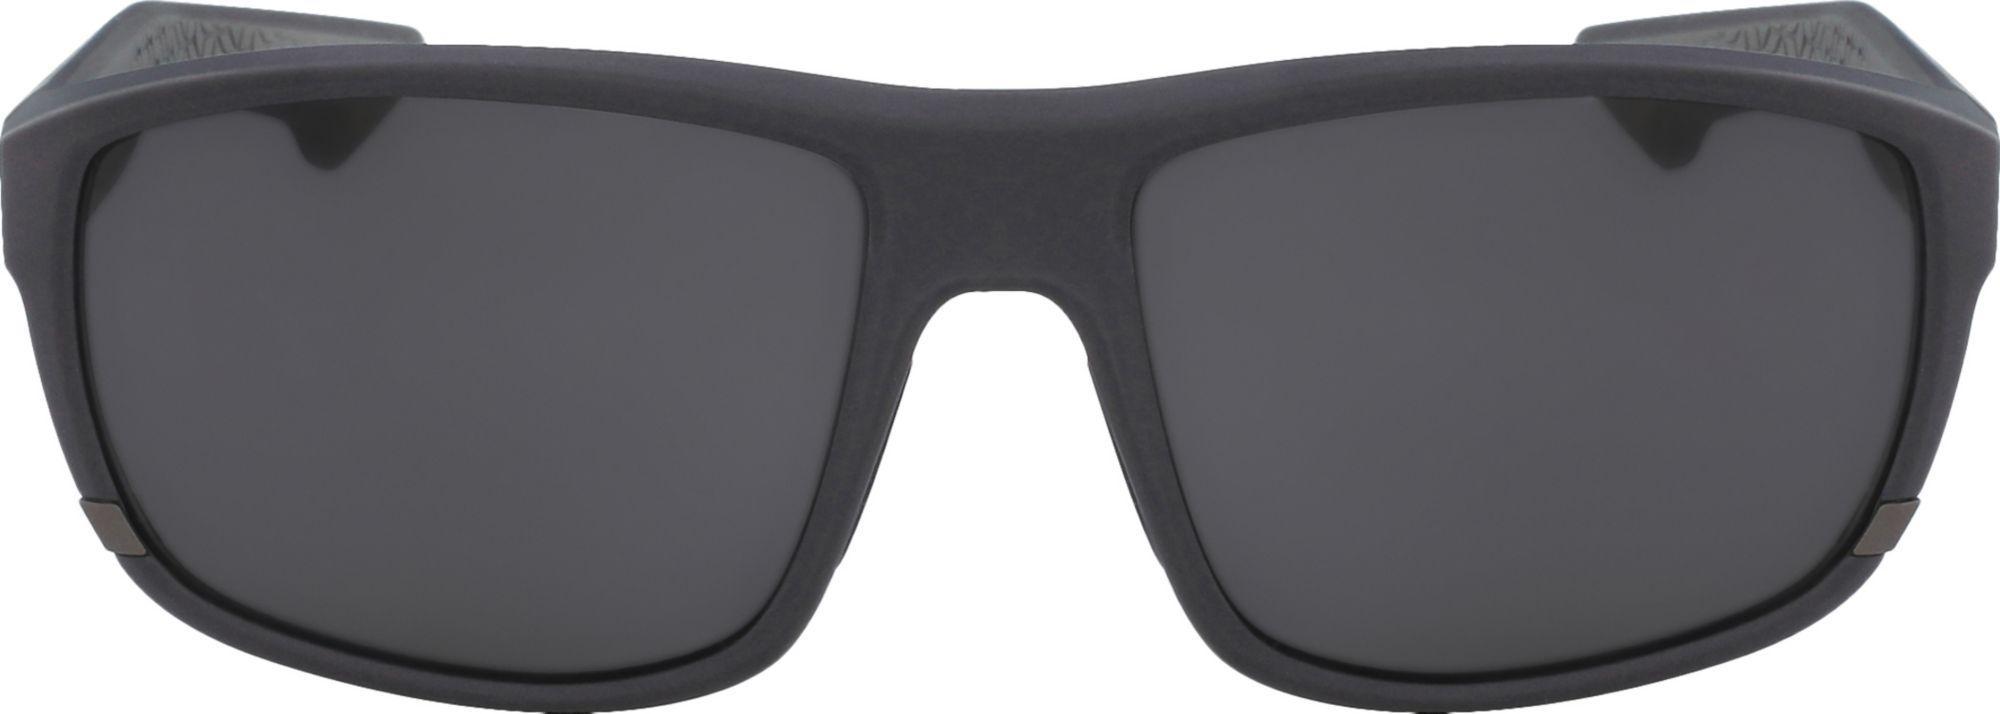 a7ae79f059b74 Columbia - Gray Airgill Lite Pfg Polarized Sunglasses for Men - Lyst. View  fullscreen